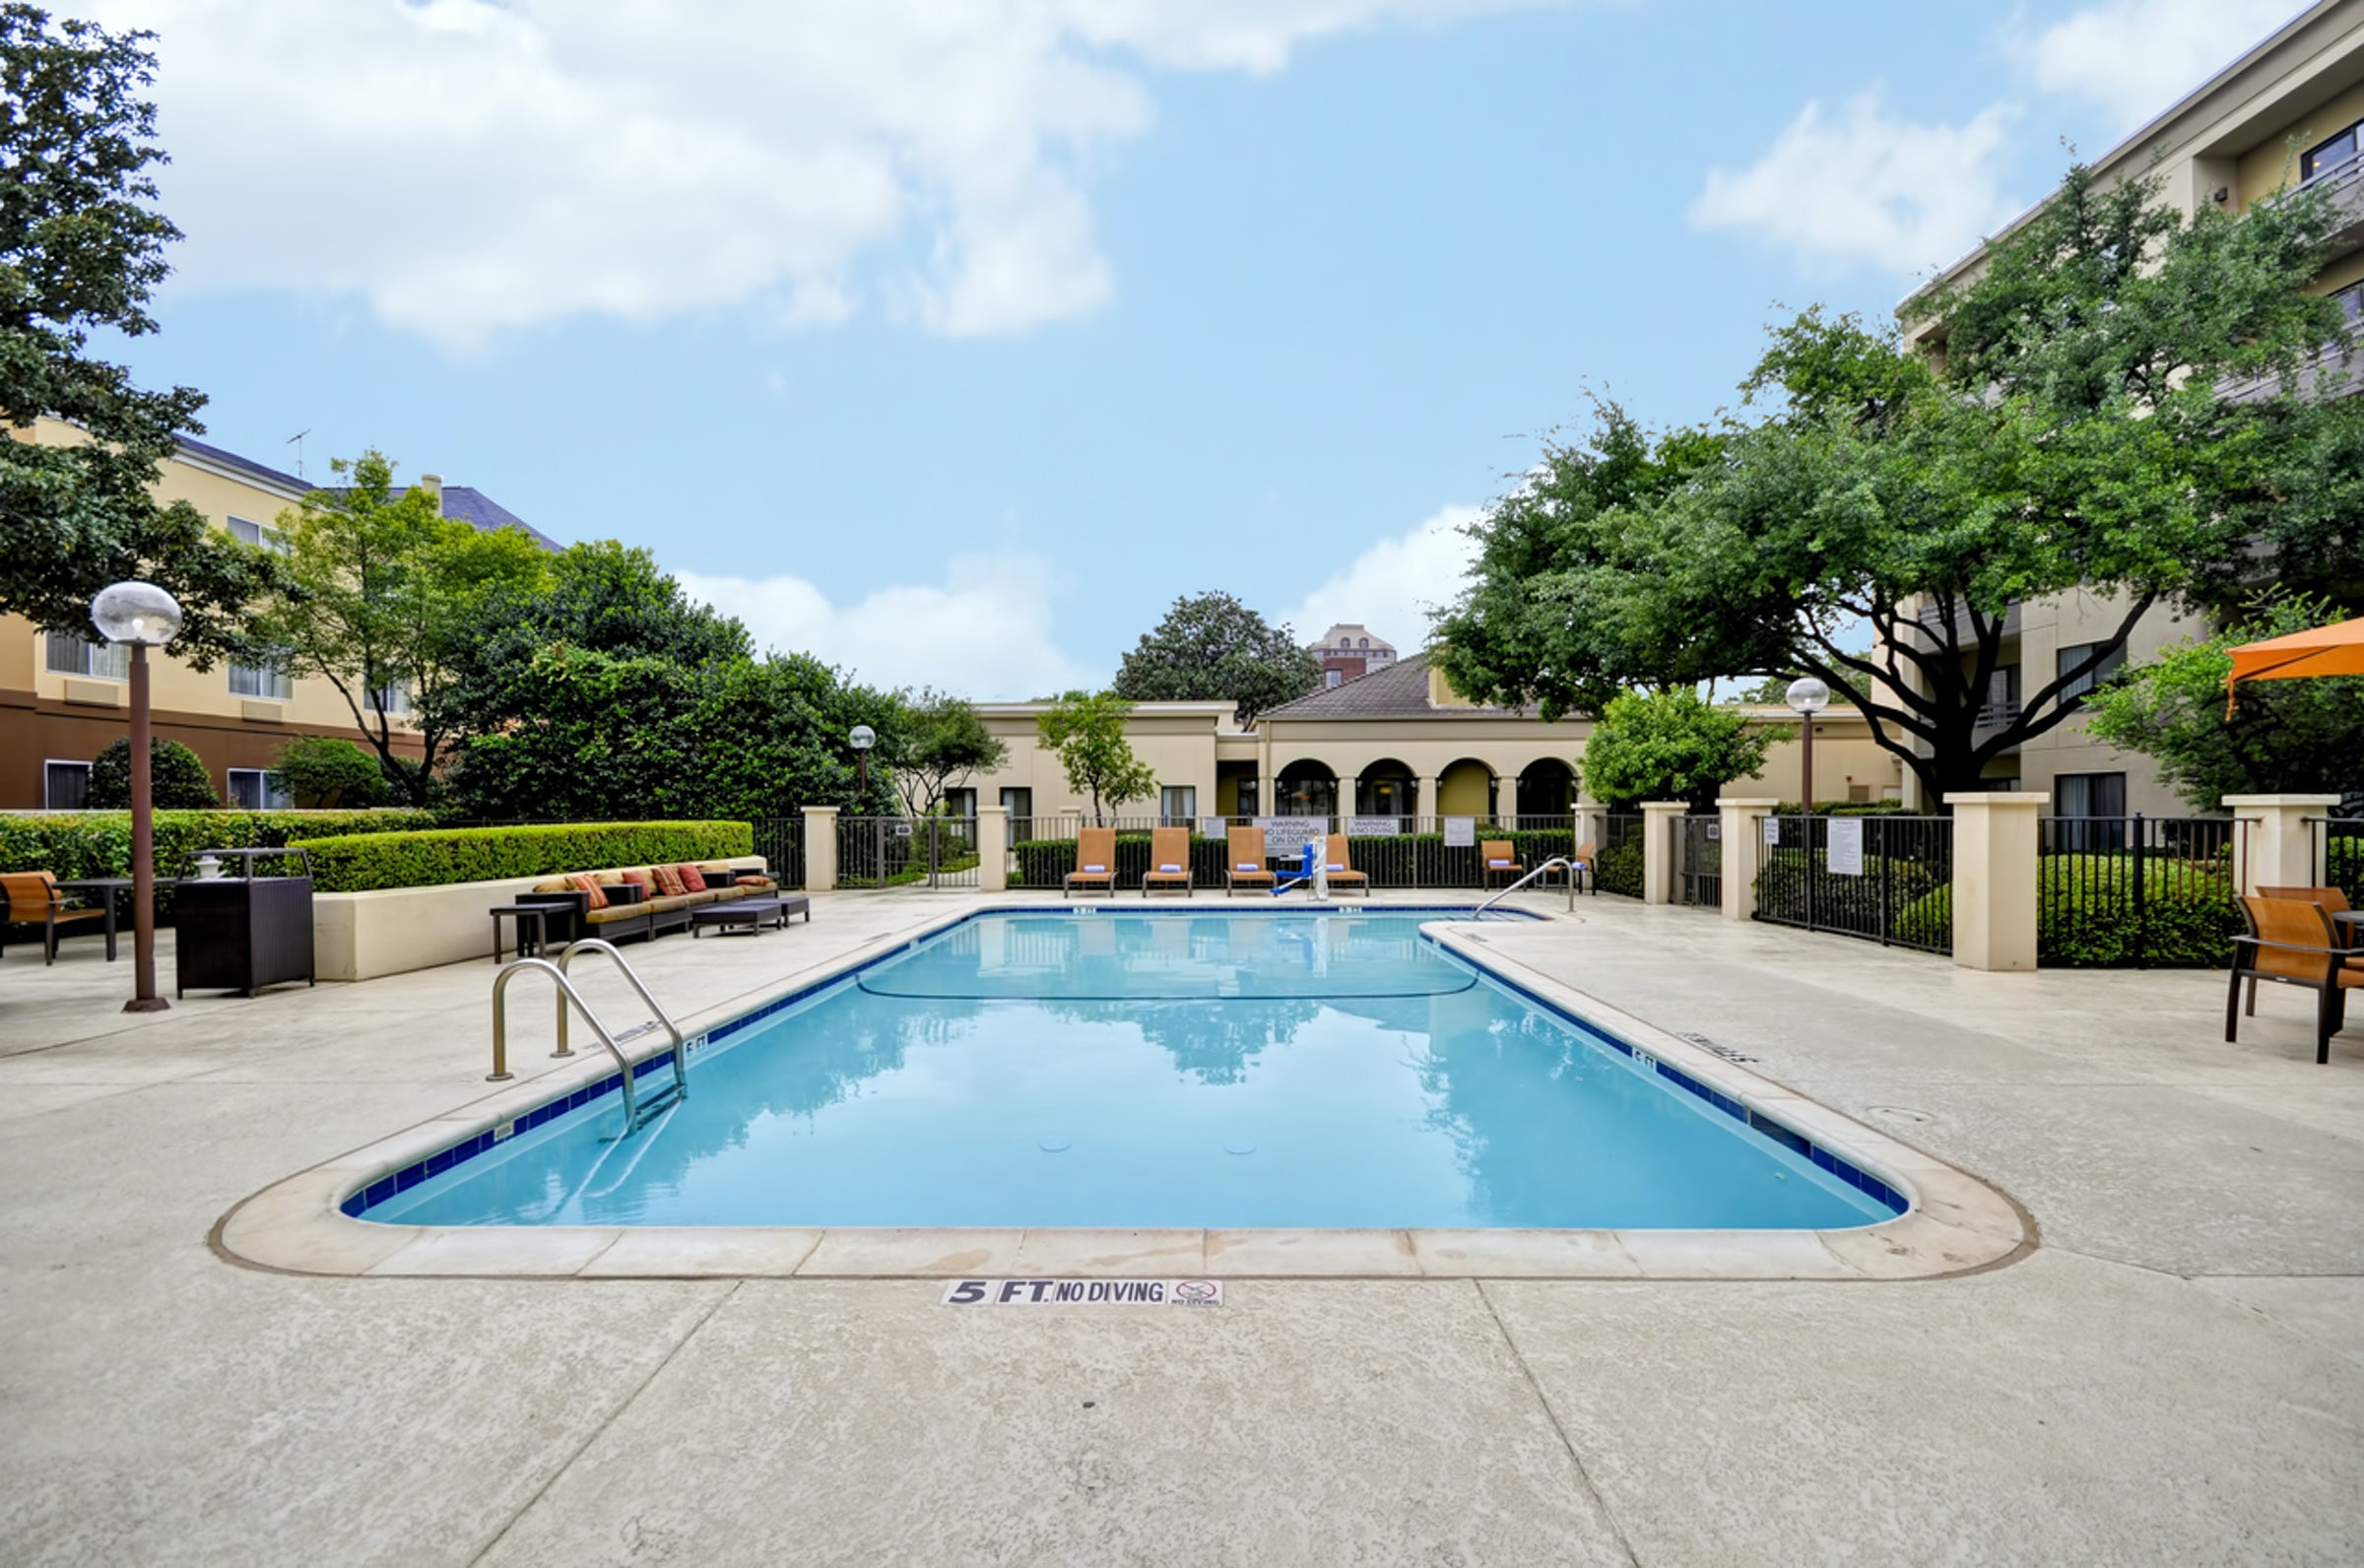 Courtyard by Marriott Dallas Medical/Market Center in Beyond Dallas